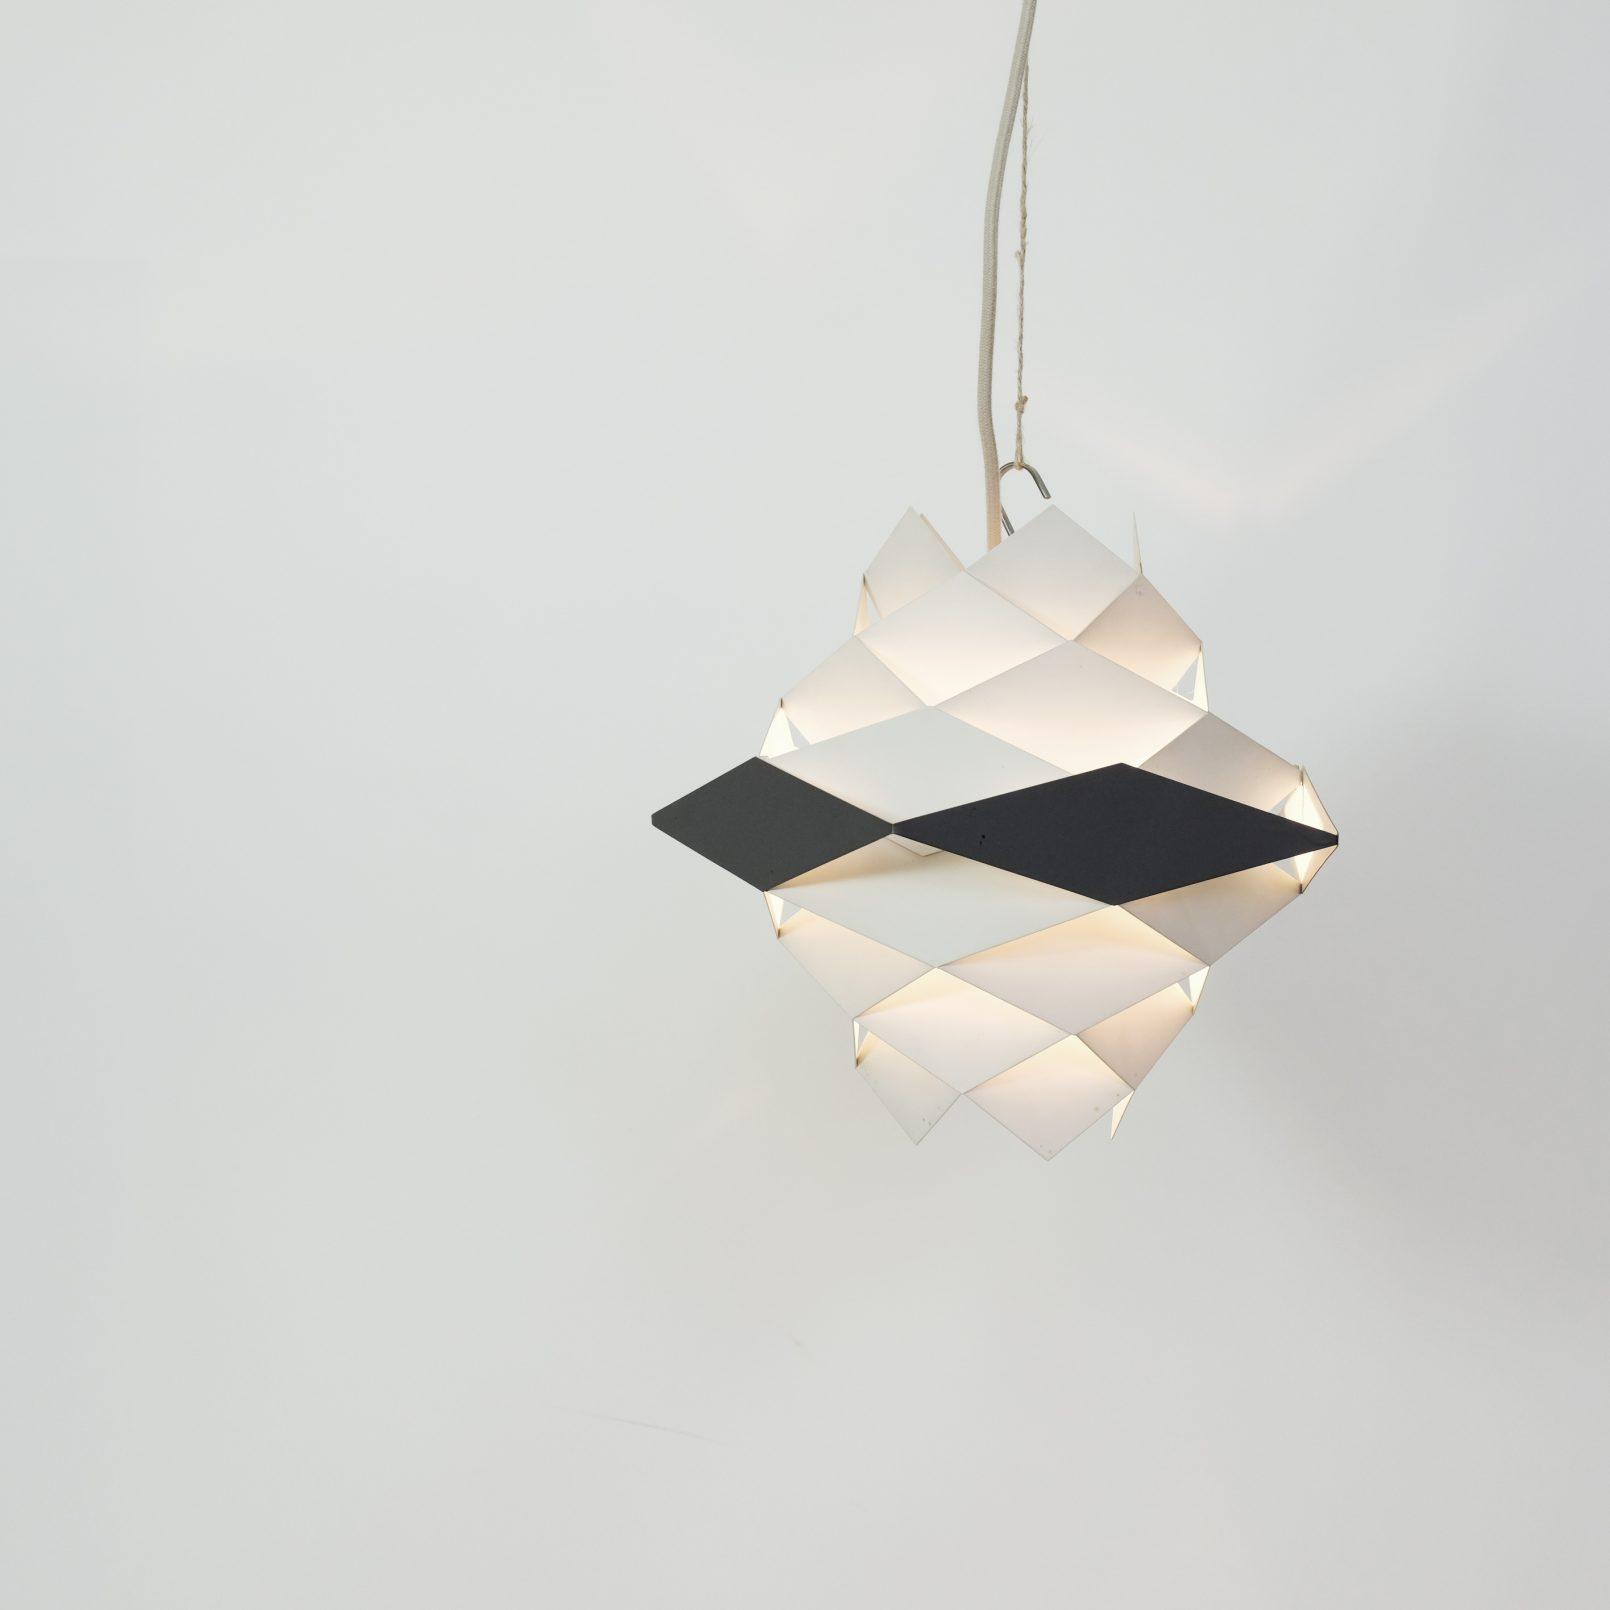 Suspension Symfoni, Preben Dahl, HF Lightings, 1960s.